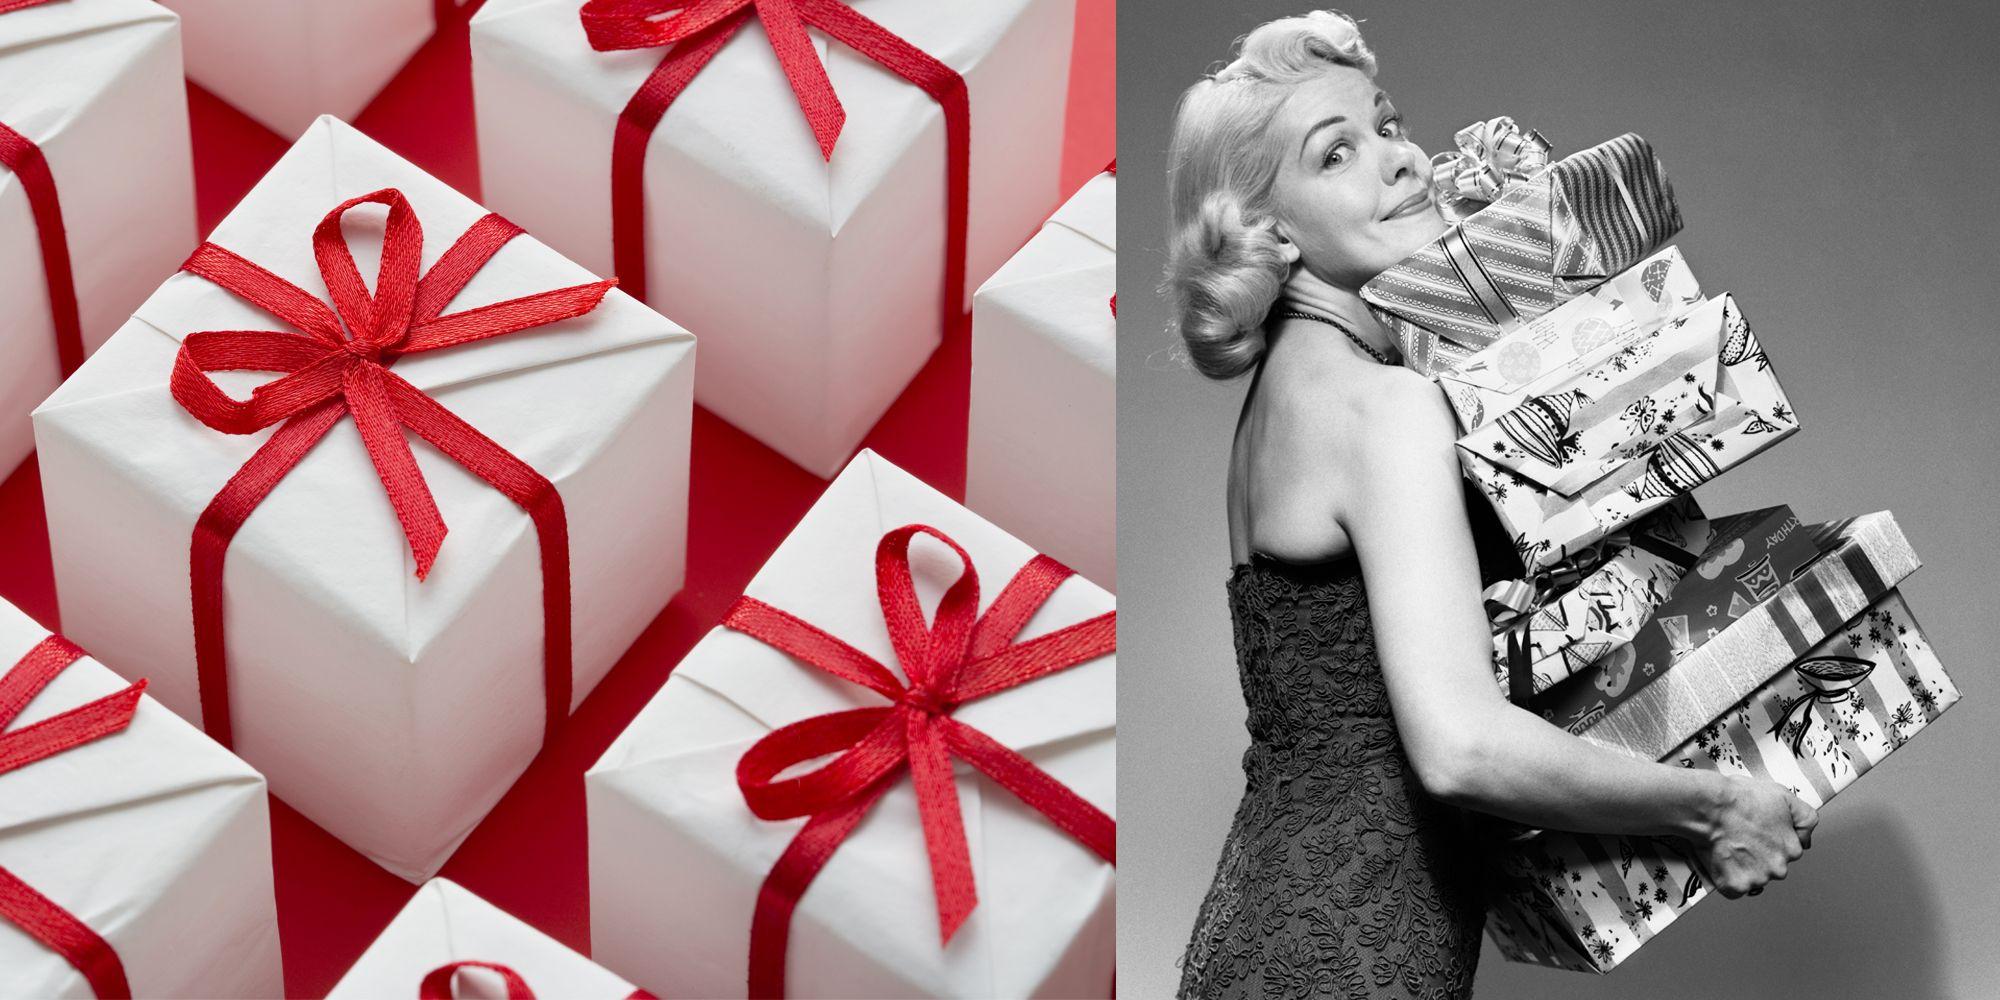 Natale 2016 7 Regali Originali Per Lui E Per Lei